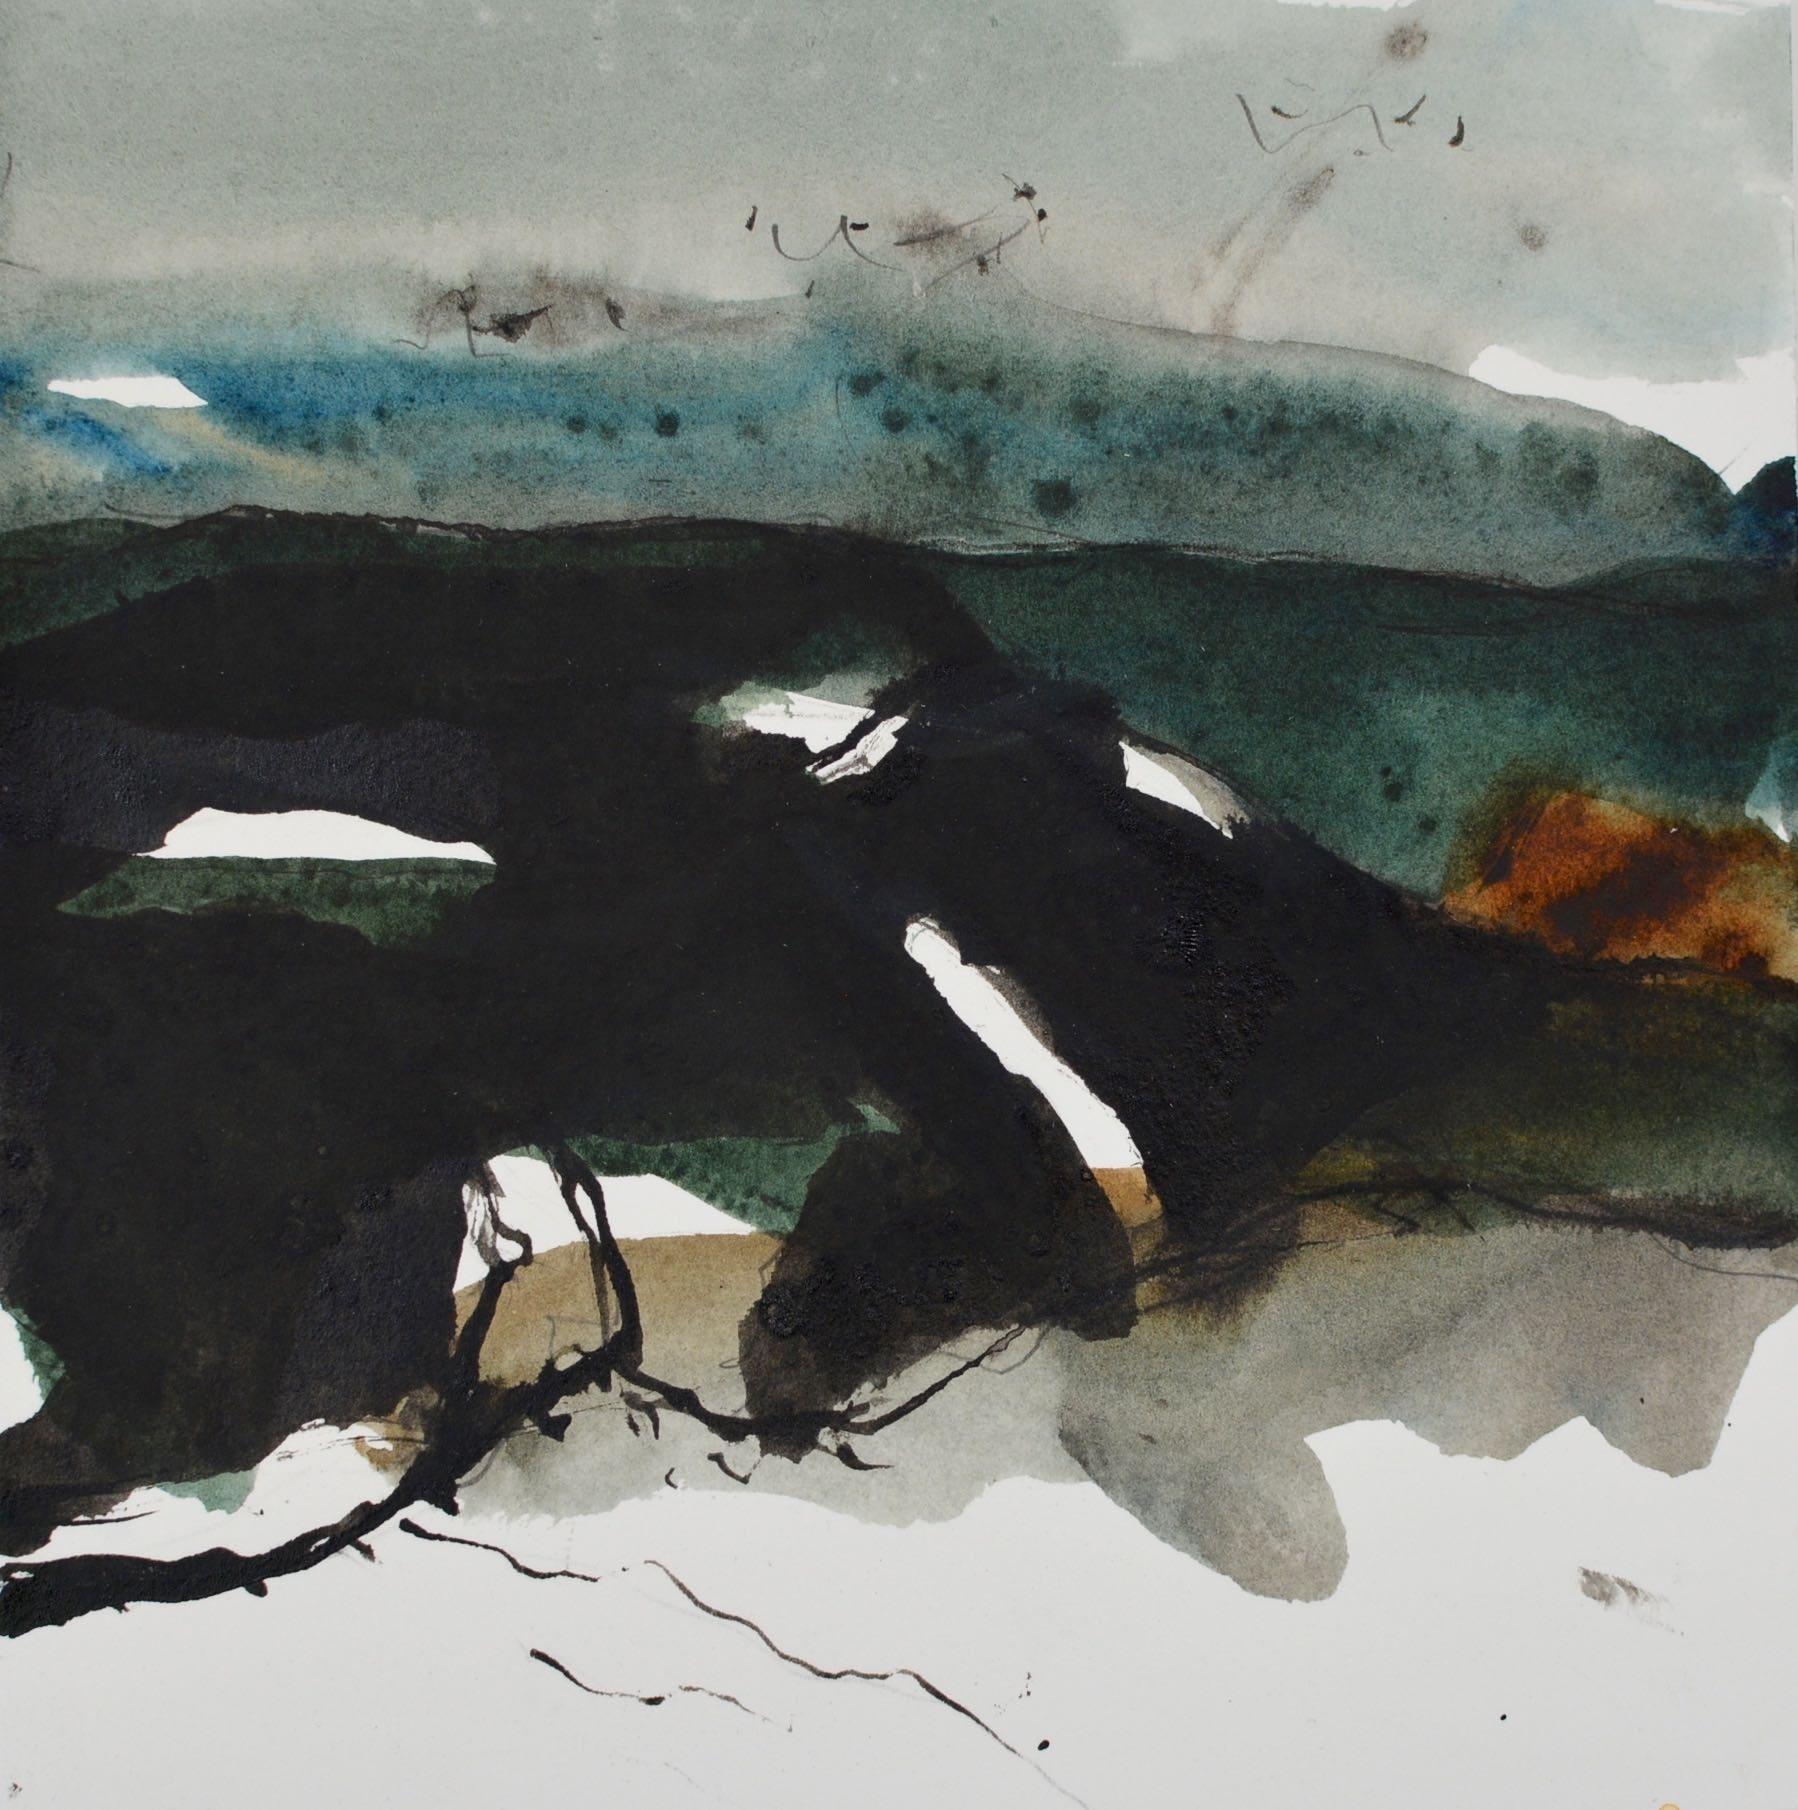 <span class=&#34;link fancybox-details-link&#34;><a href=&#34;/exhibitions/24/works/artworks_standalone10719/&#34;>View Detail Page</a></span><div class=&#34;artist&#34;><span class=&#34;artist&#34;><strong>Jim Hunter</strong></span></div><div class=&#34;title&#34;><em>East Man</em></div><div class=&#34;medium&#34;>watercolour & ink</div><div class=&#34;dimensions&#34;>38 x 36cm</div>